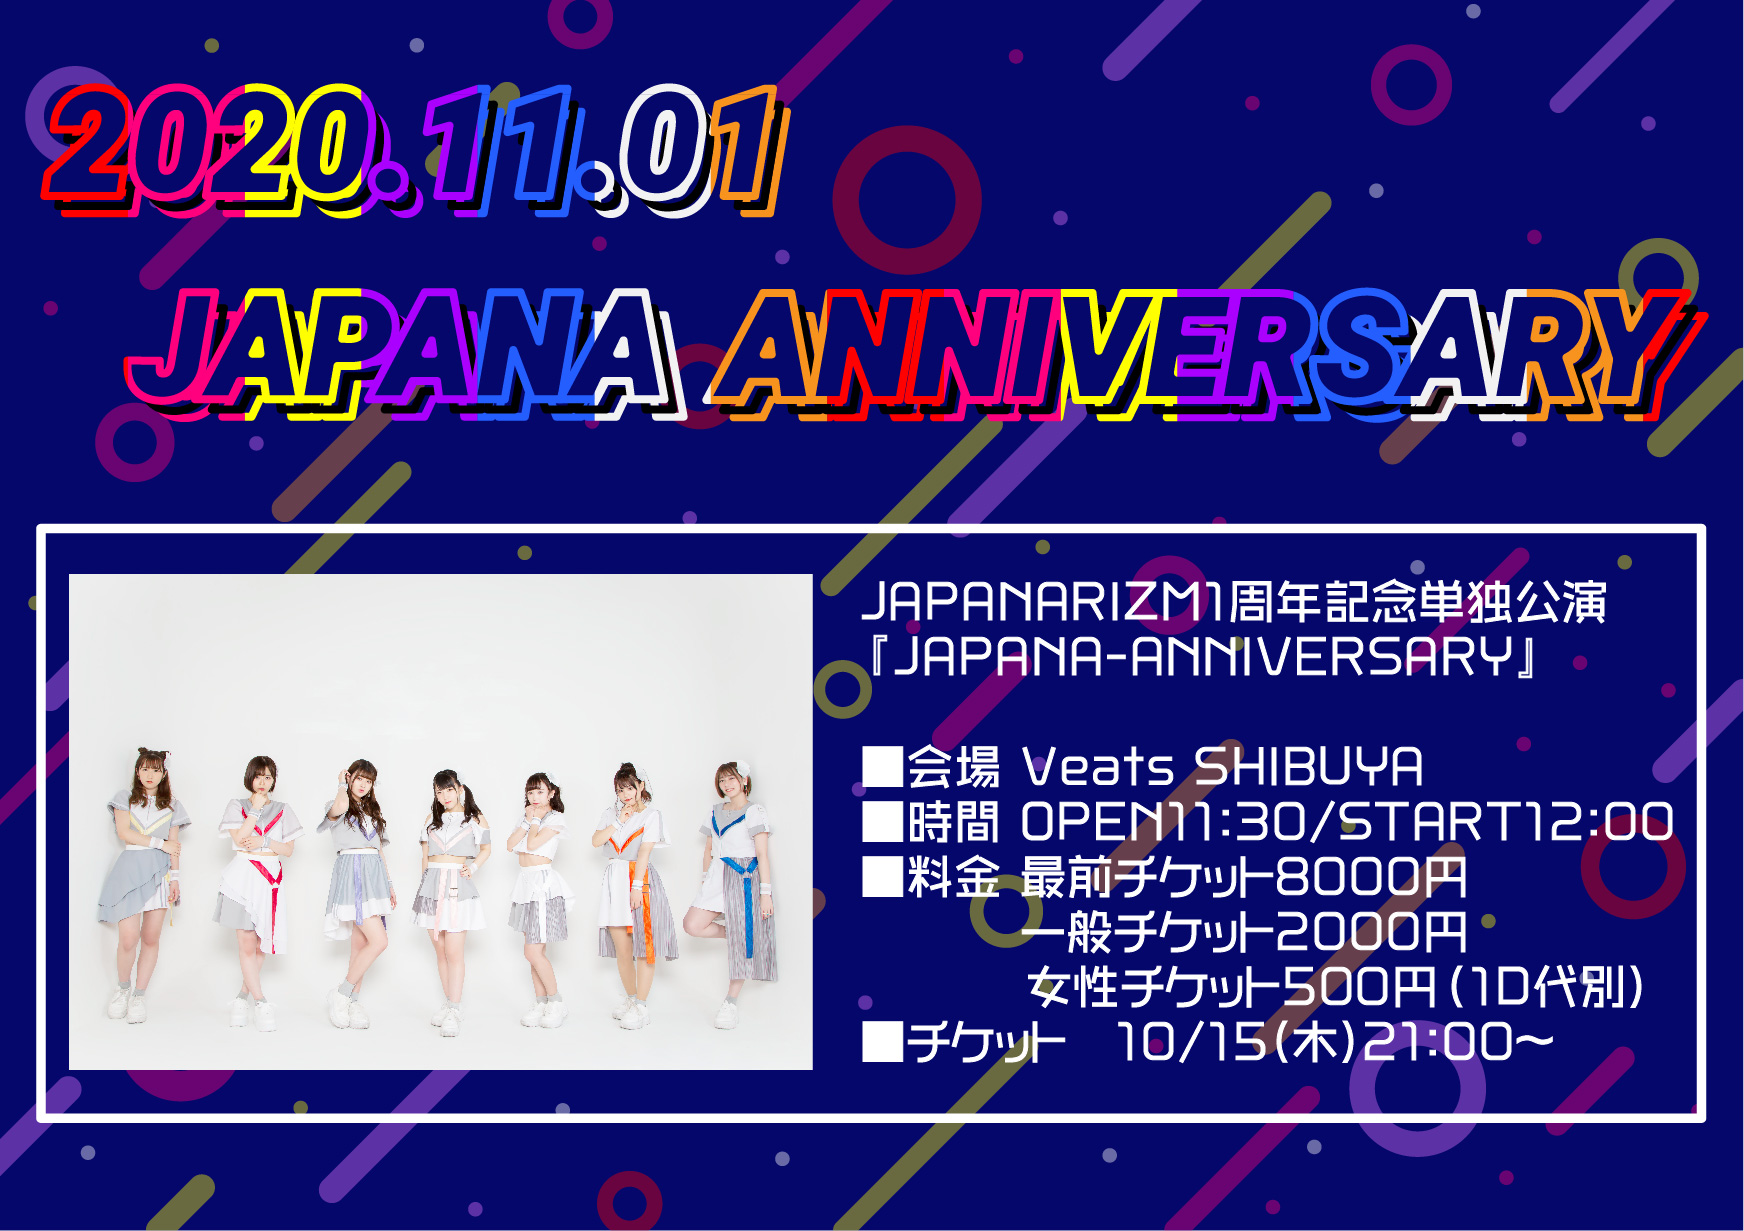 2020/11/1(日) JAPANARIZM1周年記念単独公演『JAPANA ANNIVERSARY』Veats SHIBUYA